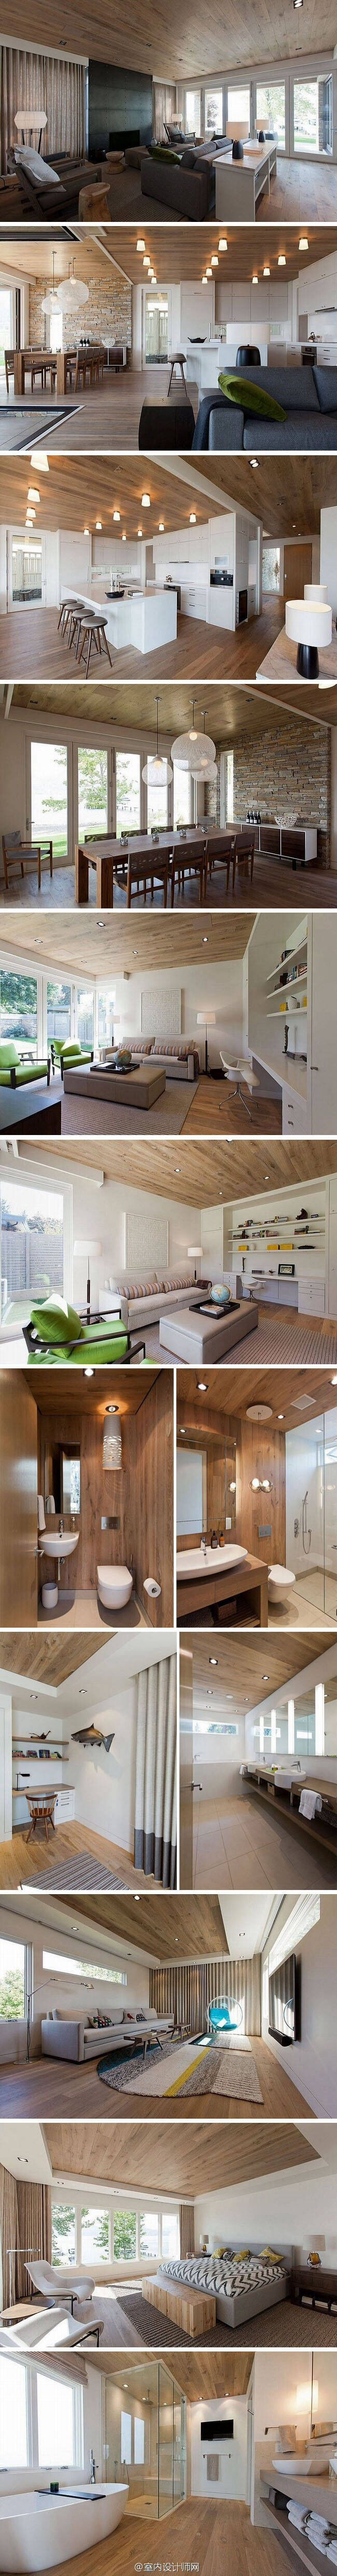 1387 best interior decos images on Pinterest